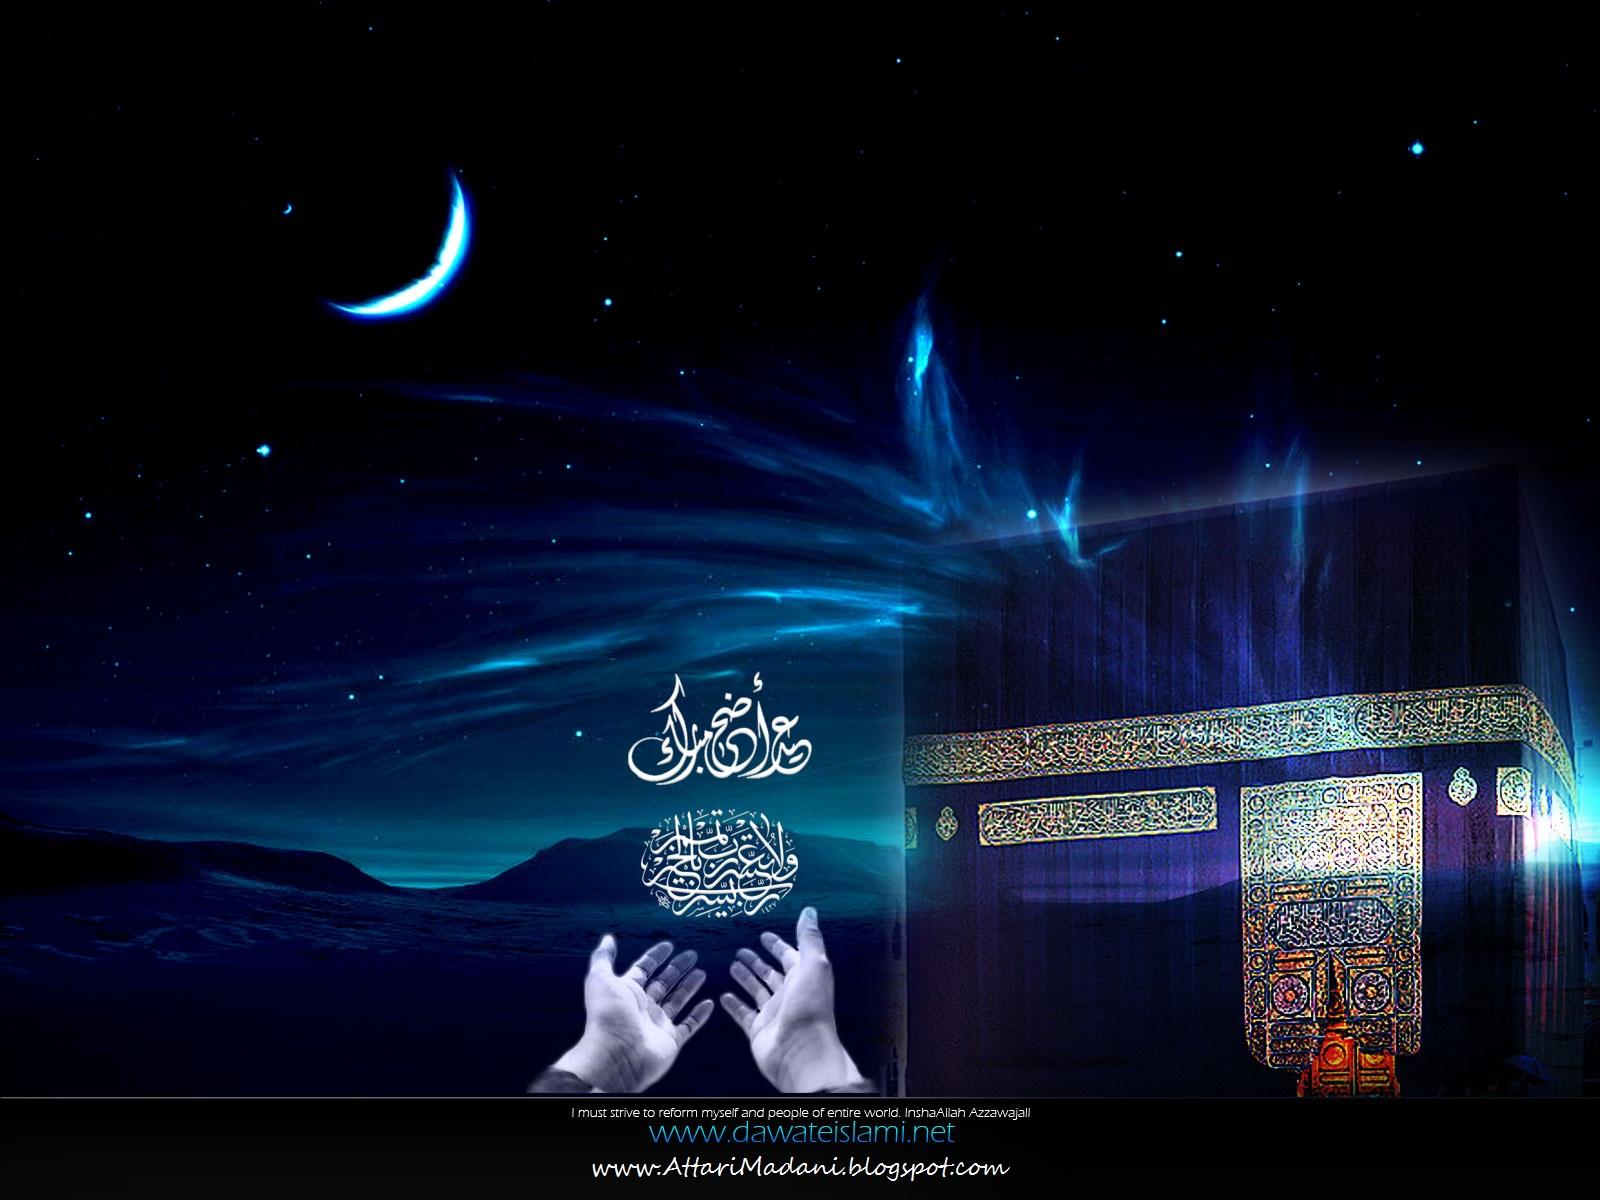 http://3.bp.blogspot.com/-6oocATPiH4w/ToQQidKOXPI/AAAAAAAAAlE/Xw44ikaOSys/s1600/Hajj-And-Eid-Adha-Wallpaper-Dawat-e-Islami-1.jpg